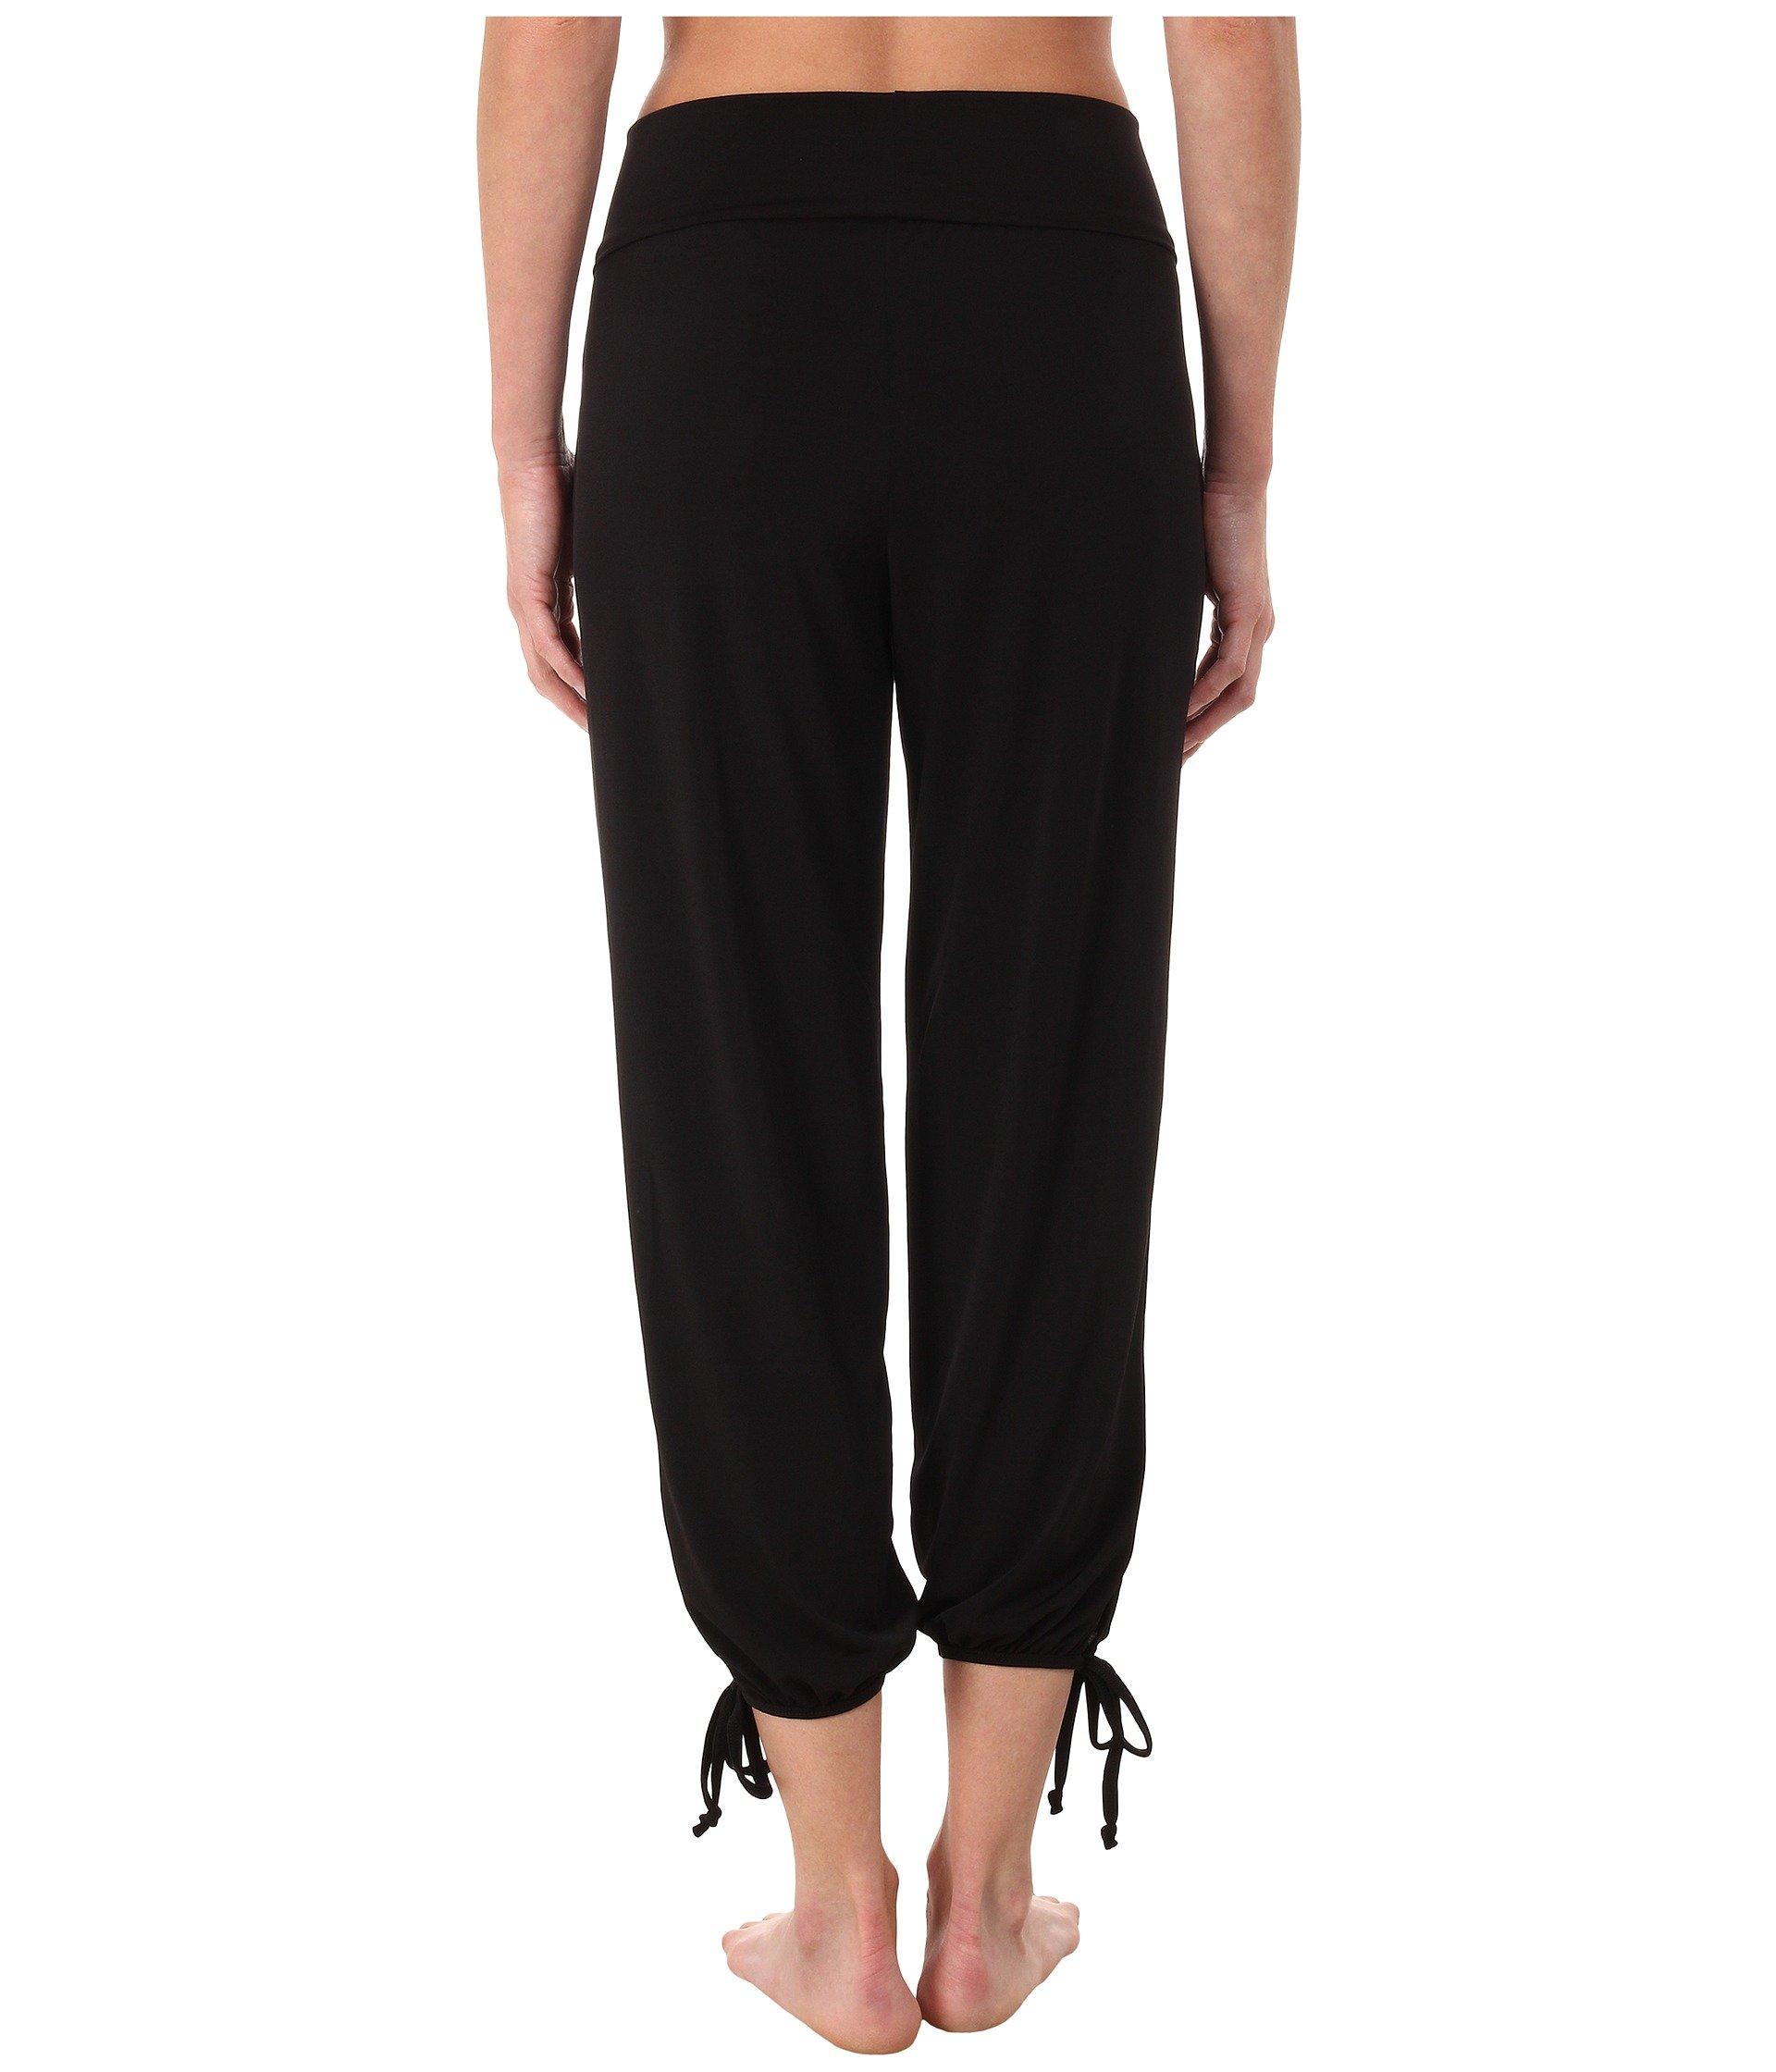 Onzie Black Onzie Black Pants Pants Gypsy Gypsy Pants Black Gypsy Onzie YCq6ICR